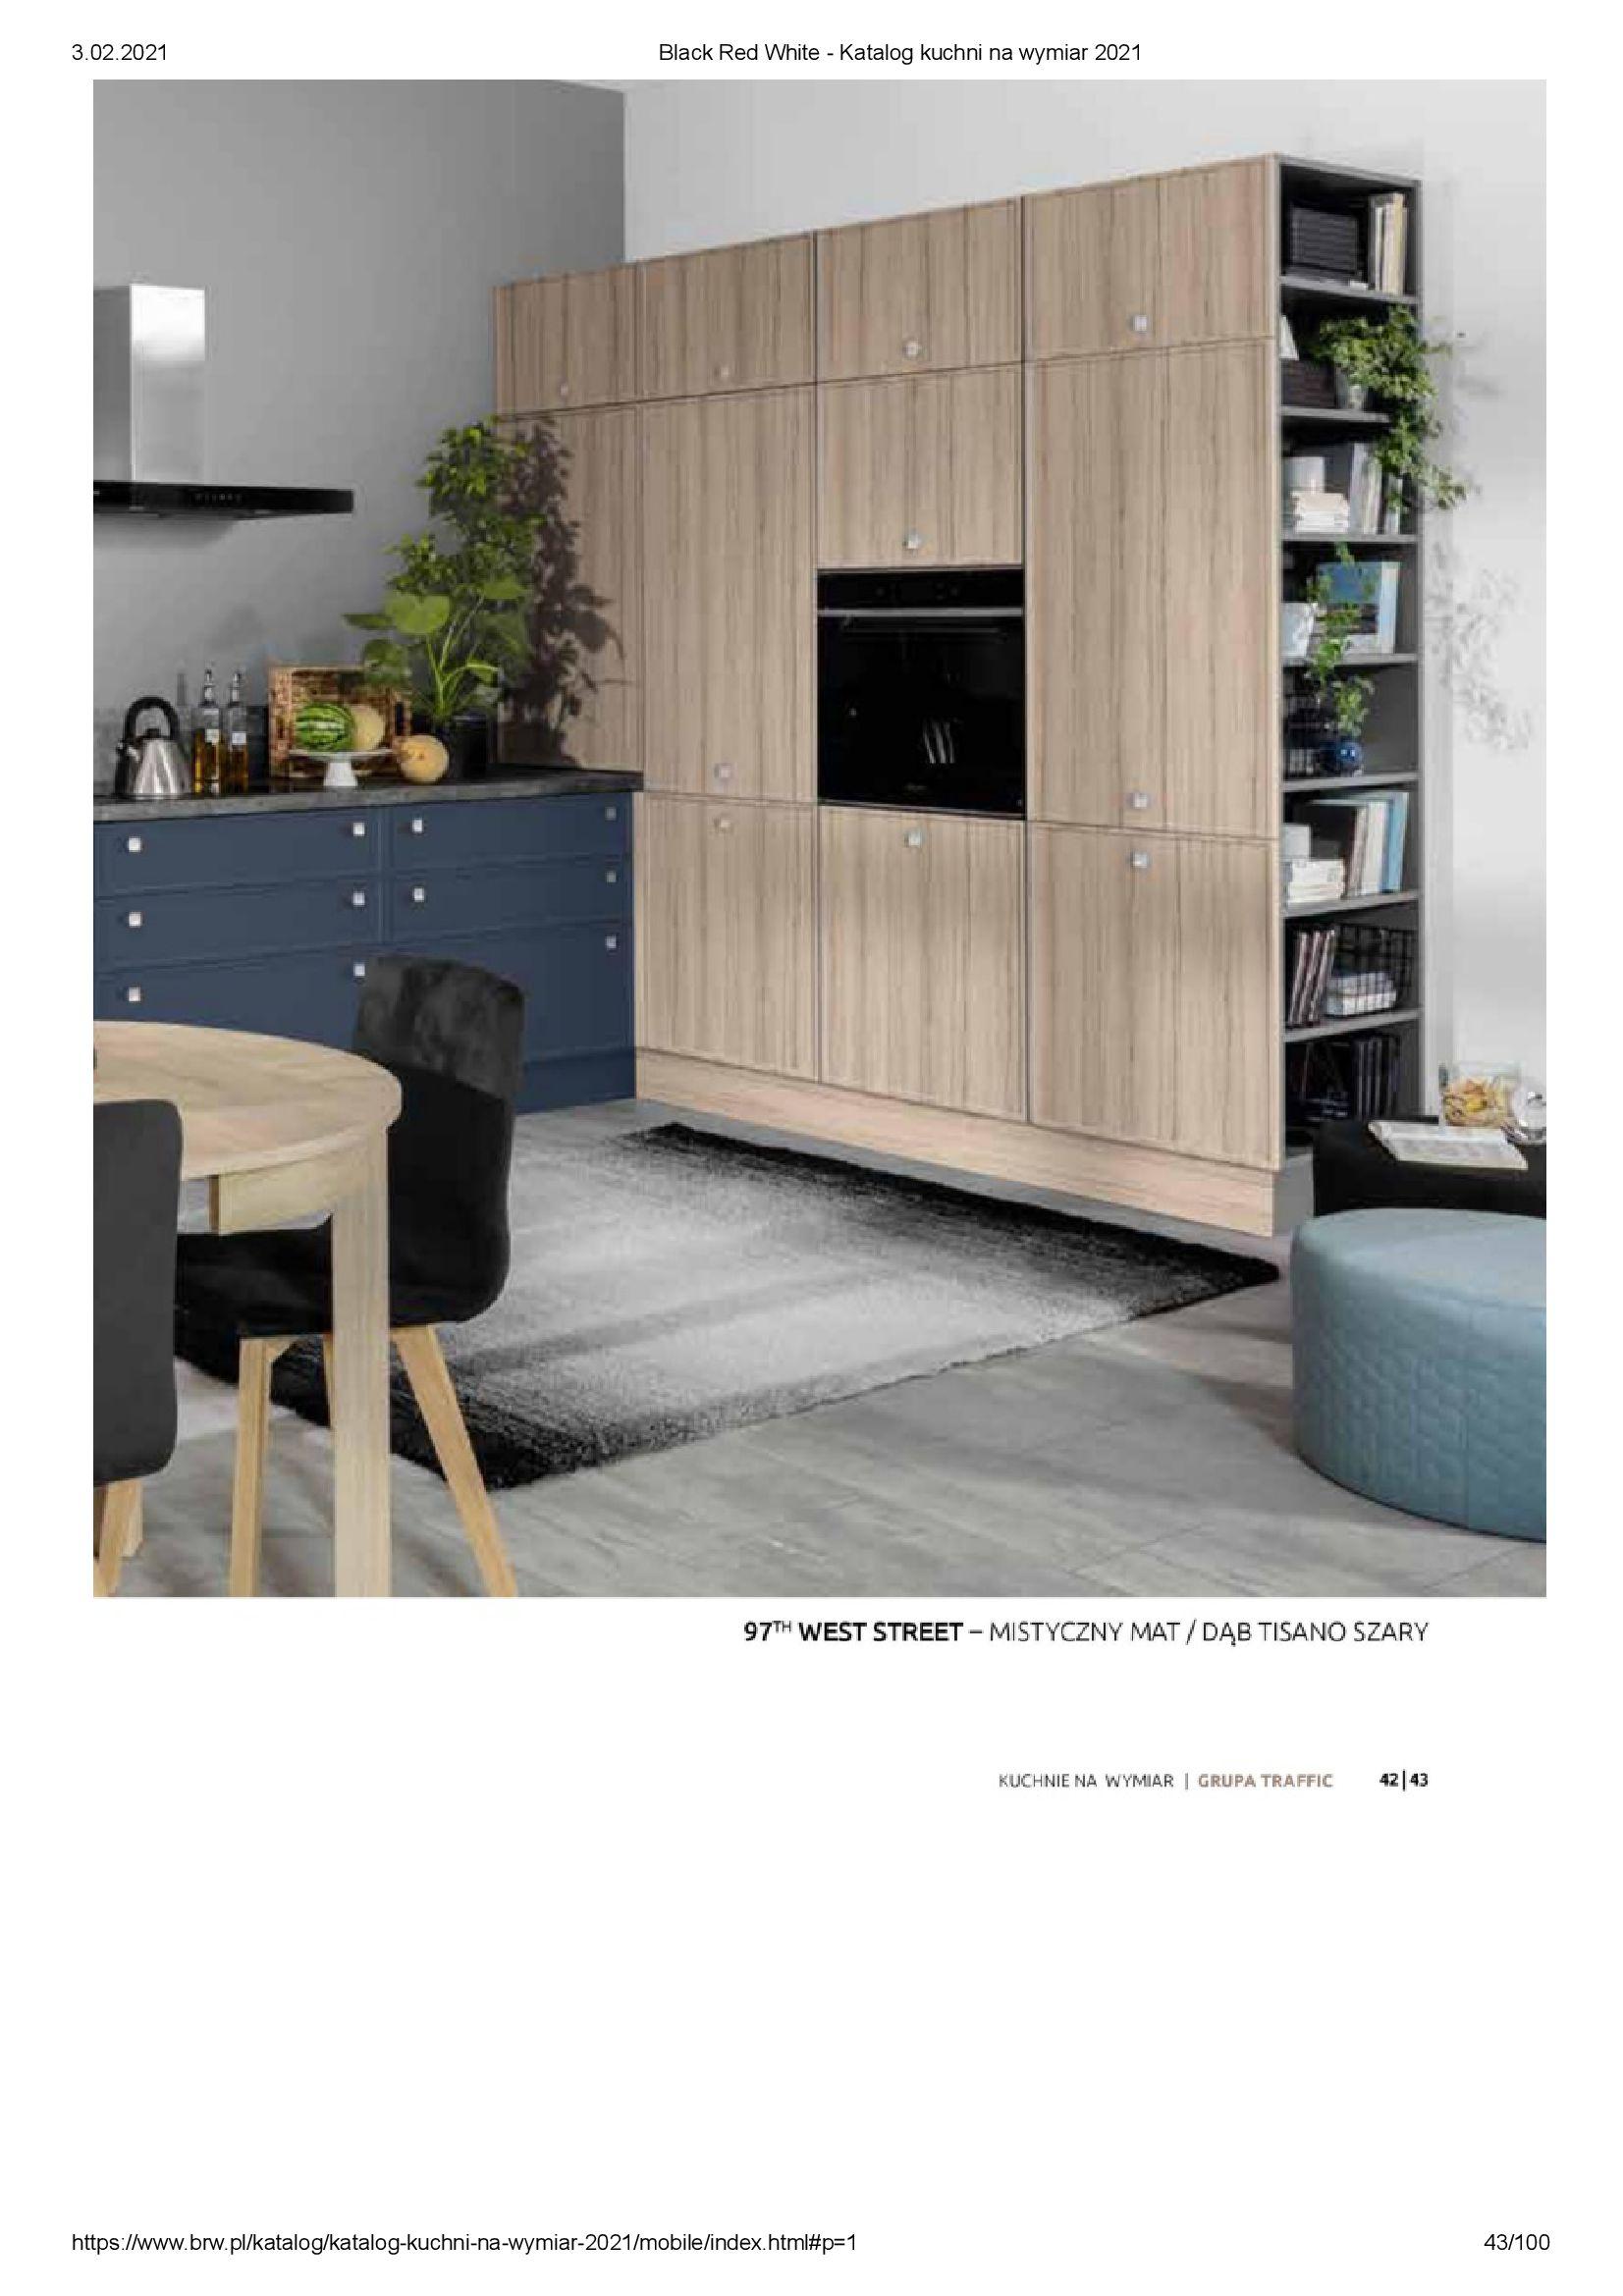 Gazetka Black Red White: Katalog - Kuchnie na wymiar Senso Kitchens 2021 2021-01-01 page-43